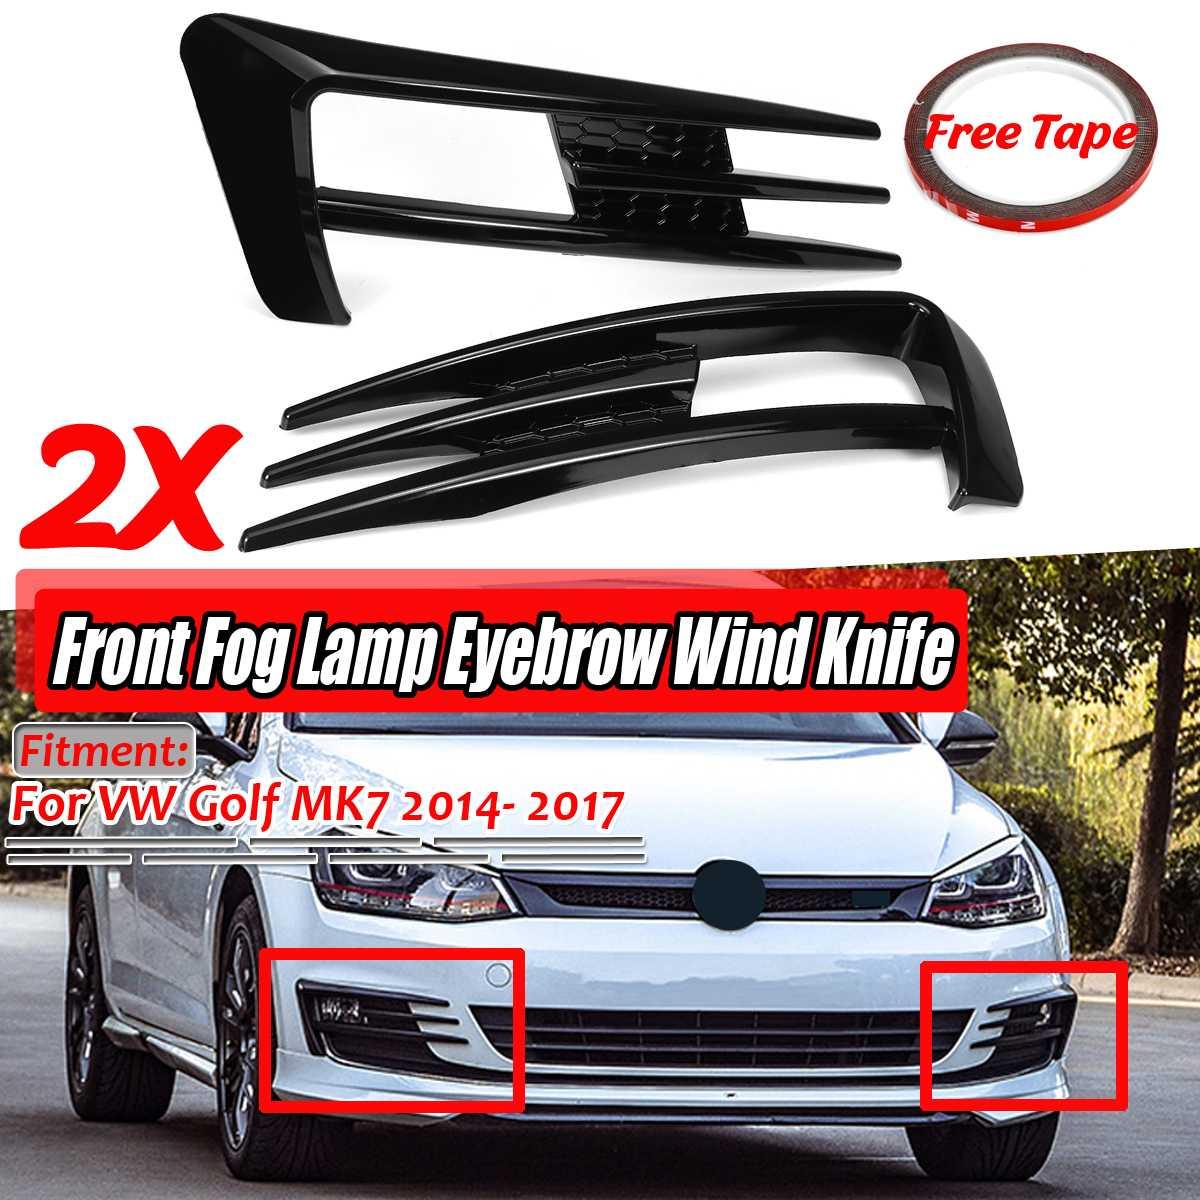 A Pair ABS Car Front Fog Lamp Eyebrow Wind Knife Cover Trim For VW For Golf MK7 2014 2015 2016 2017 Fog Light Eyebrow Eye Lid